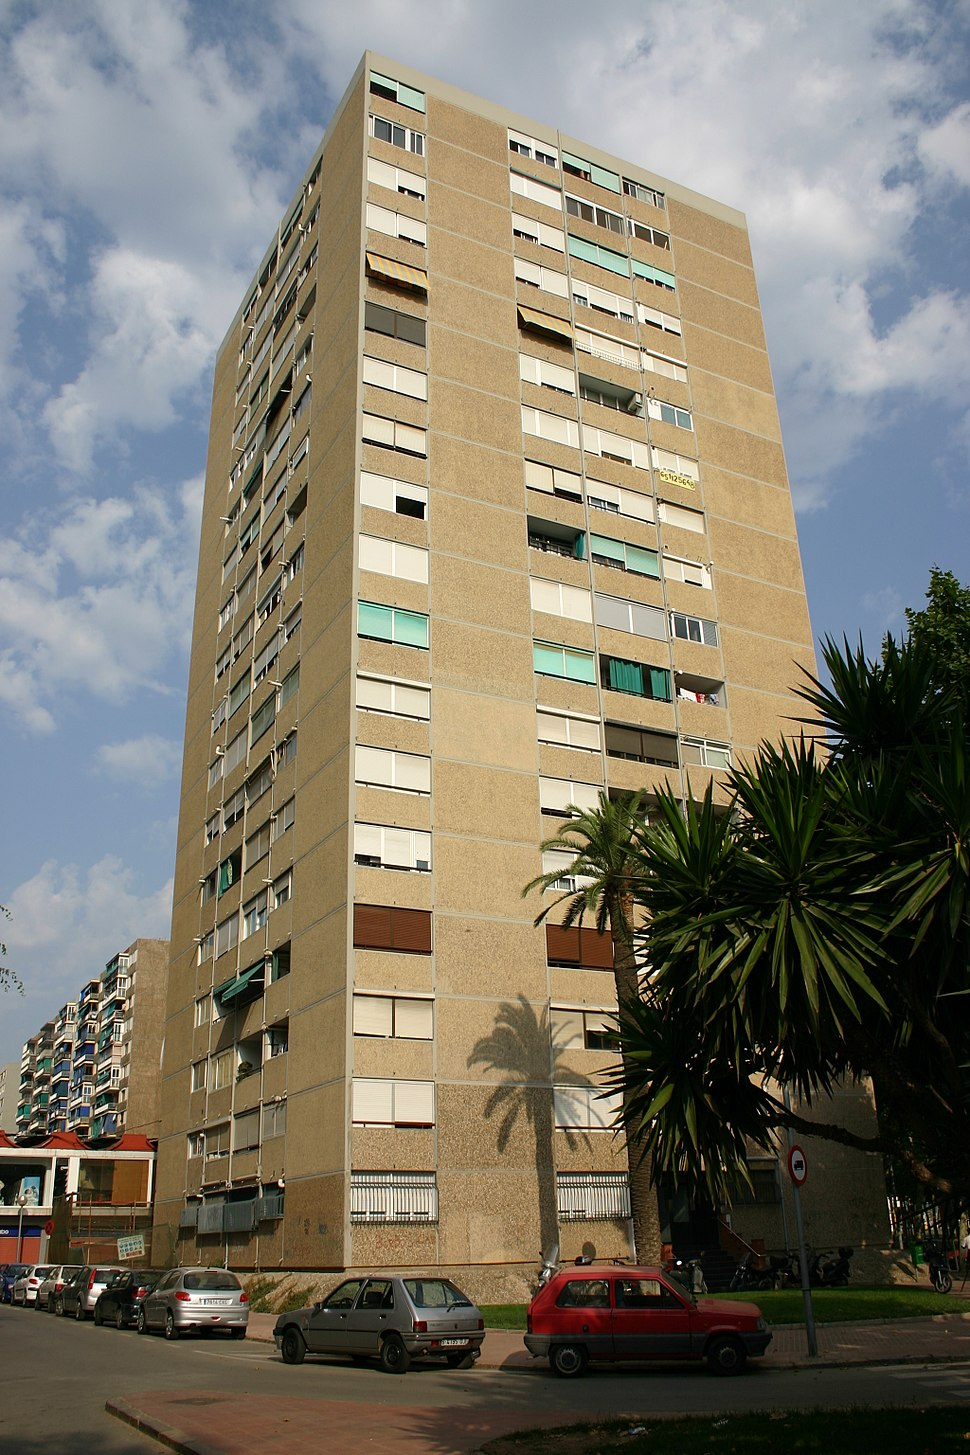 Spain.Hospitalet.Bellvitge.Edifici.jpeg